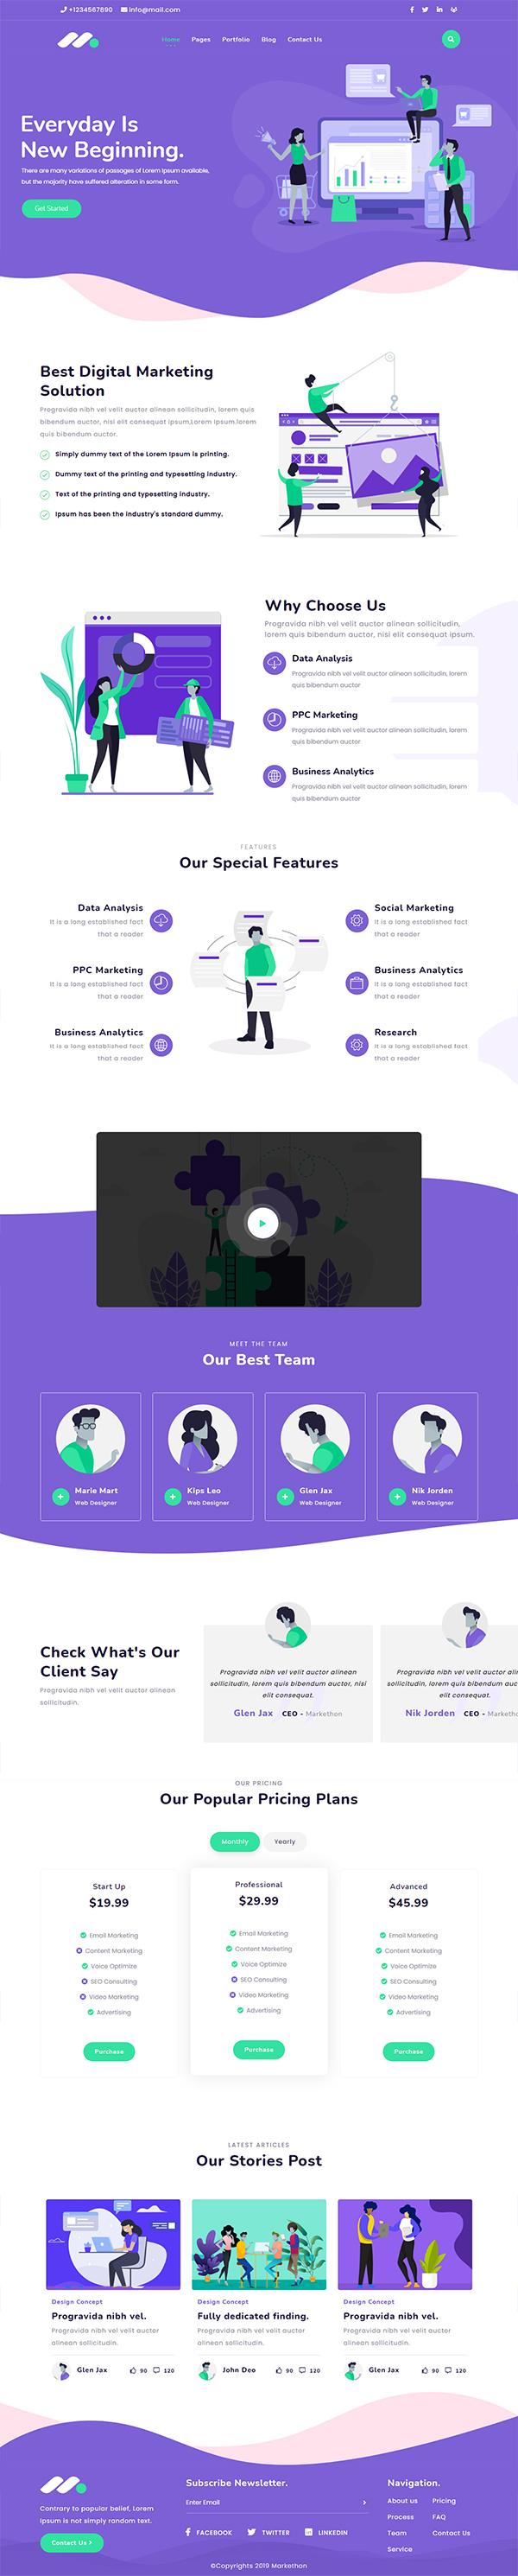 Markethon - Digital Marketing Agency Responsive HTML5 Template